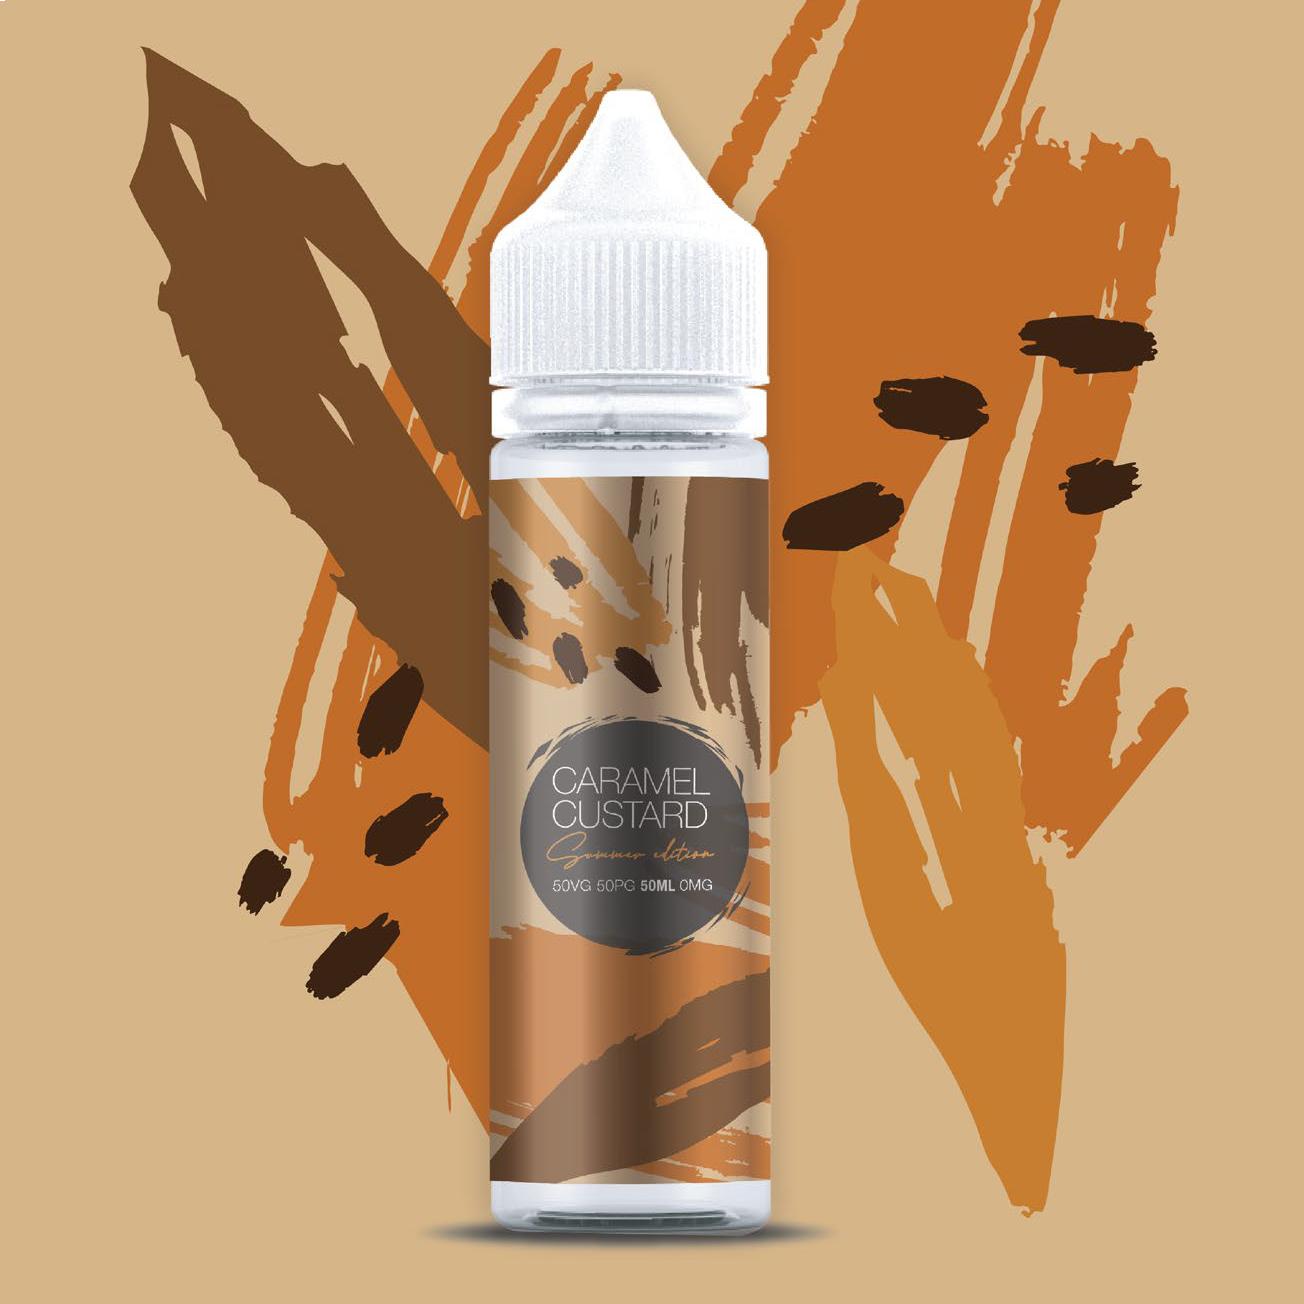 Caramel Custard Elda Summer 60ml 120ml Bottles